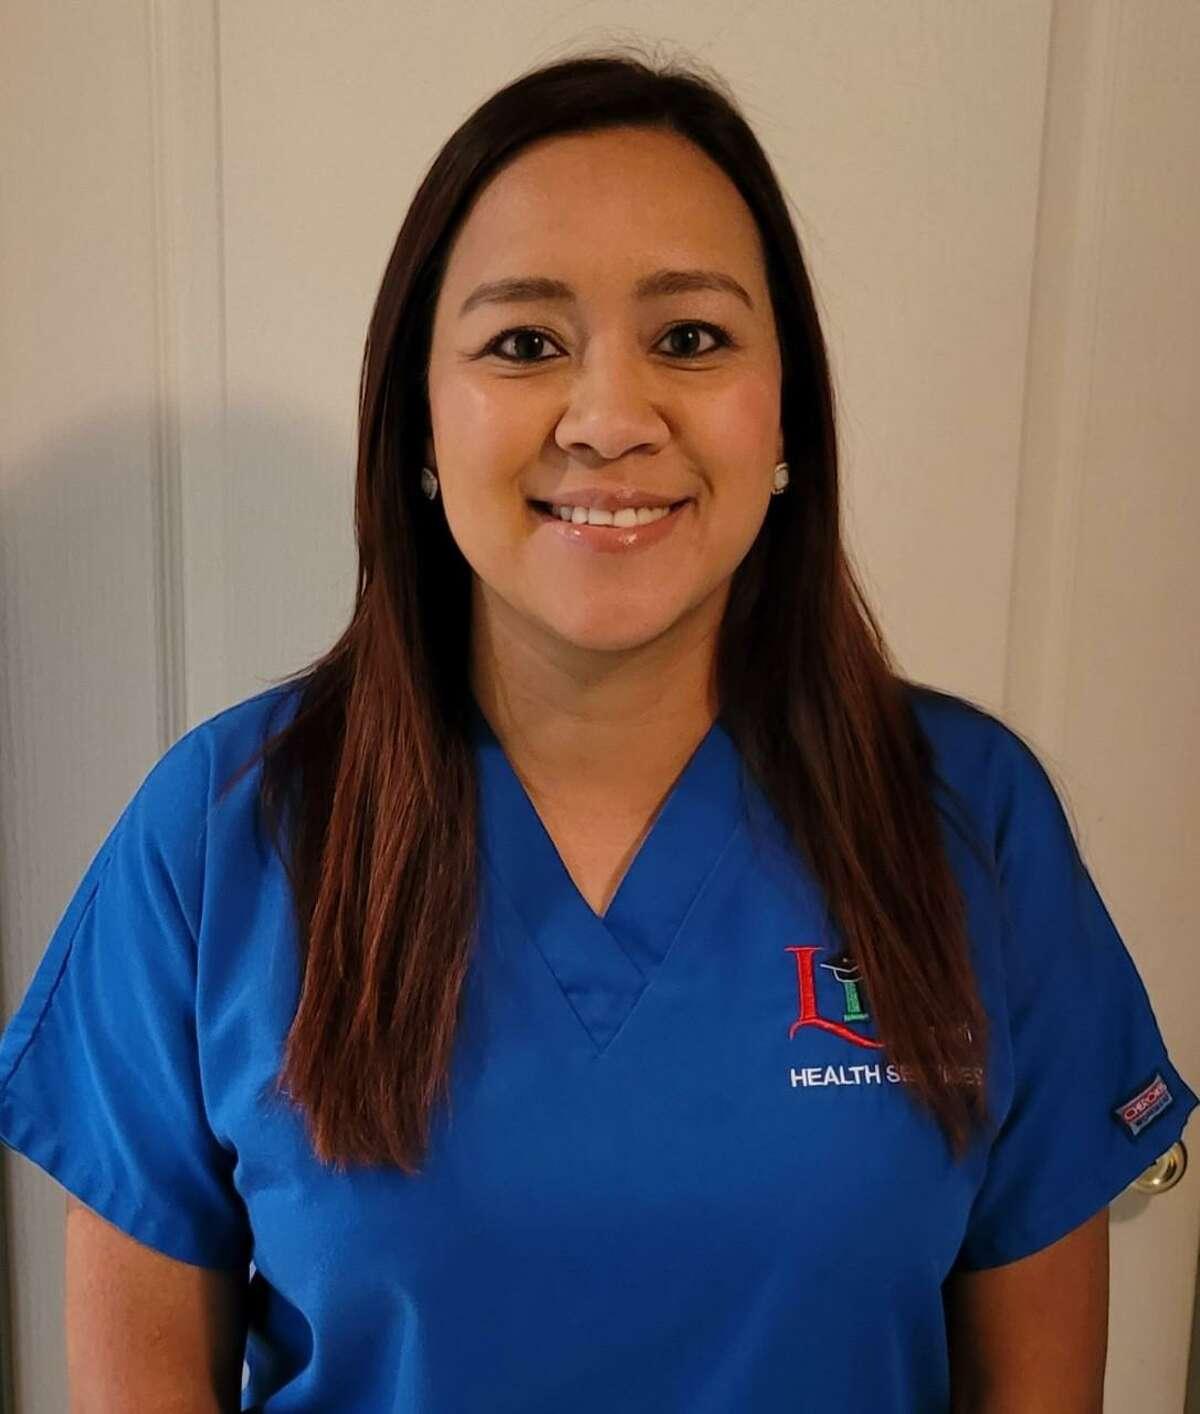 Laredo ISD Health Services Coordinator Graciela Lopez